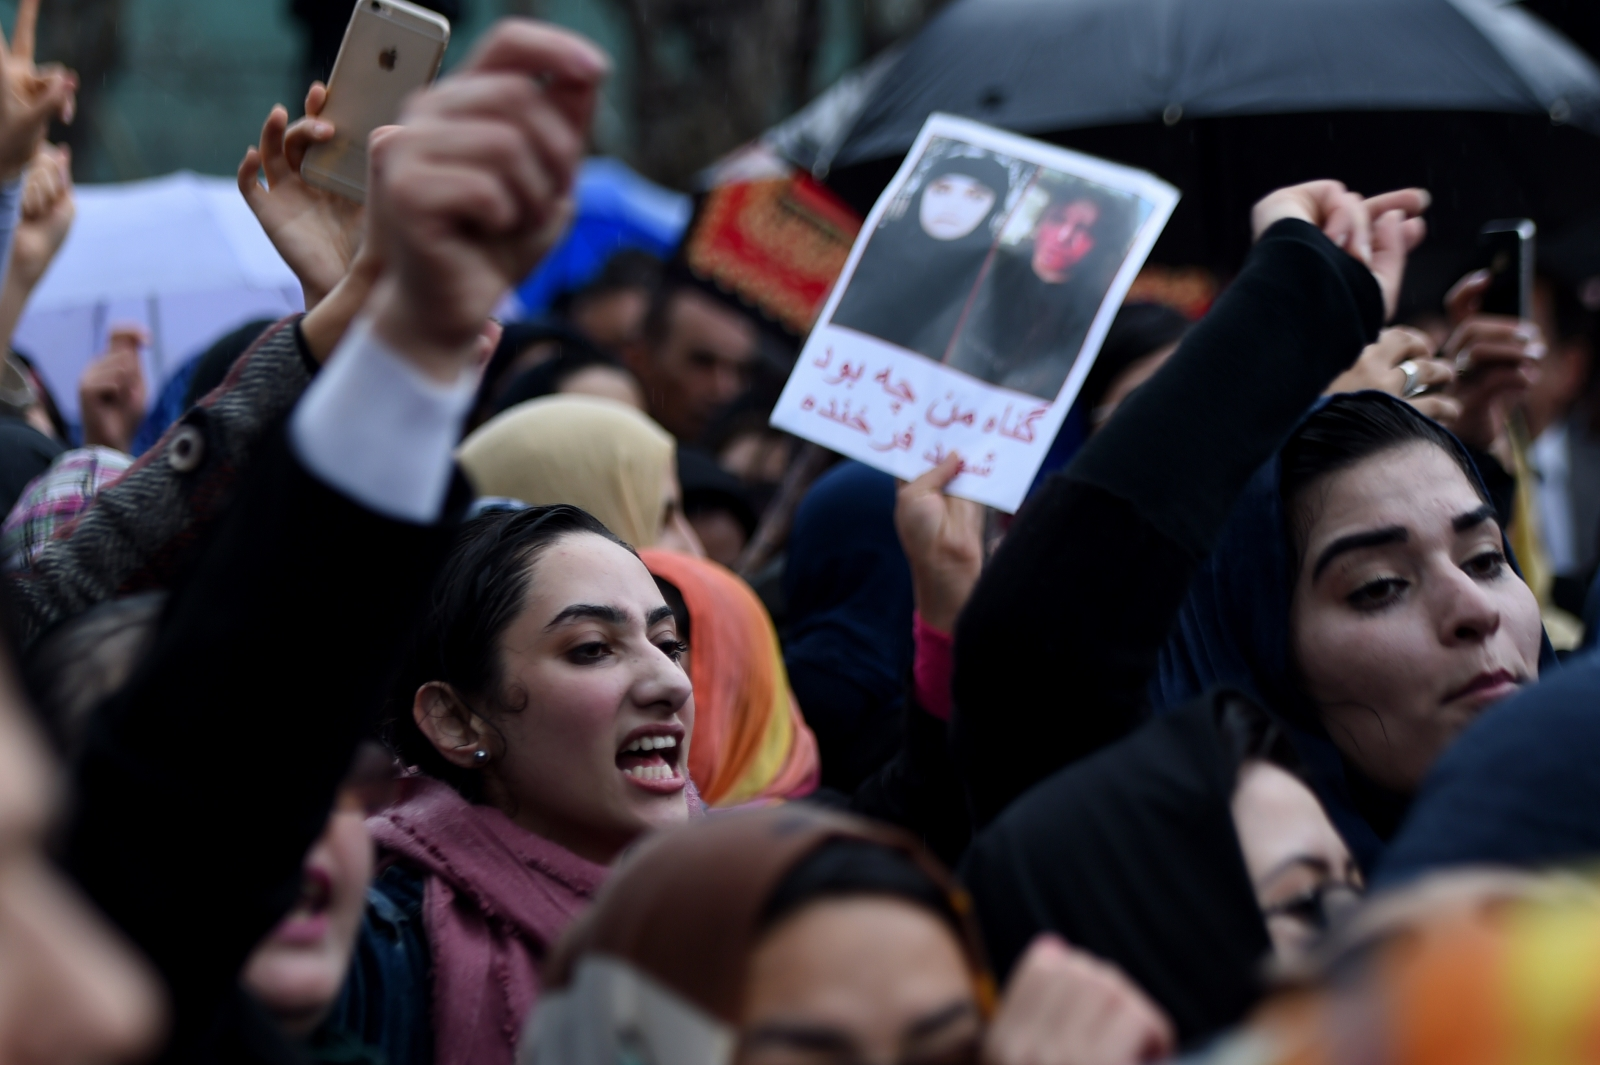 More Afghan protestors